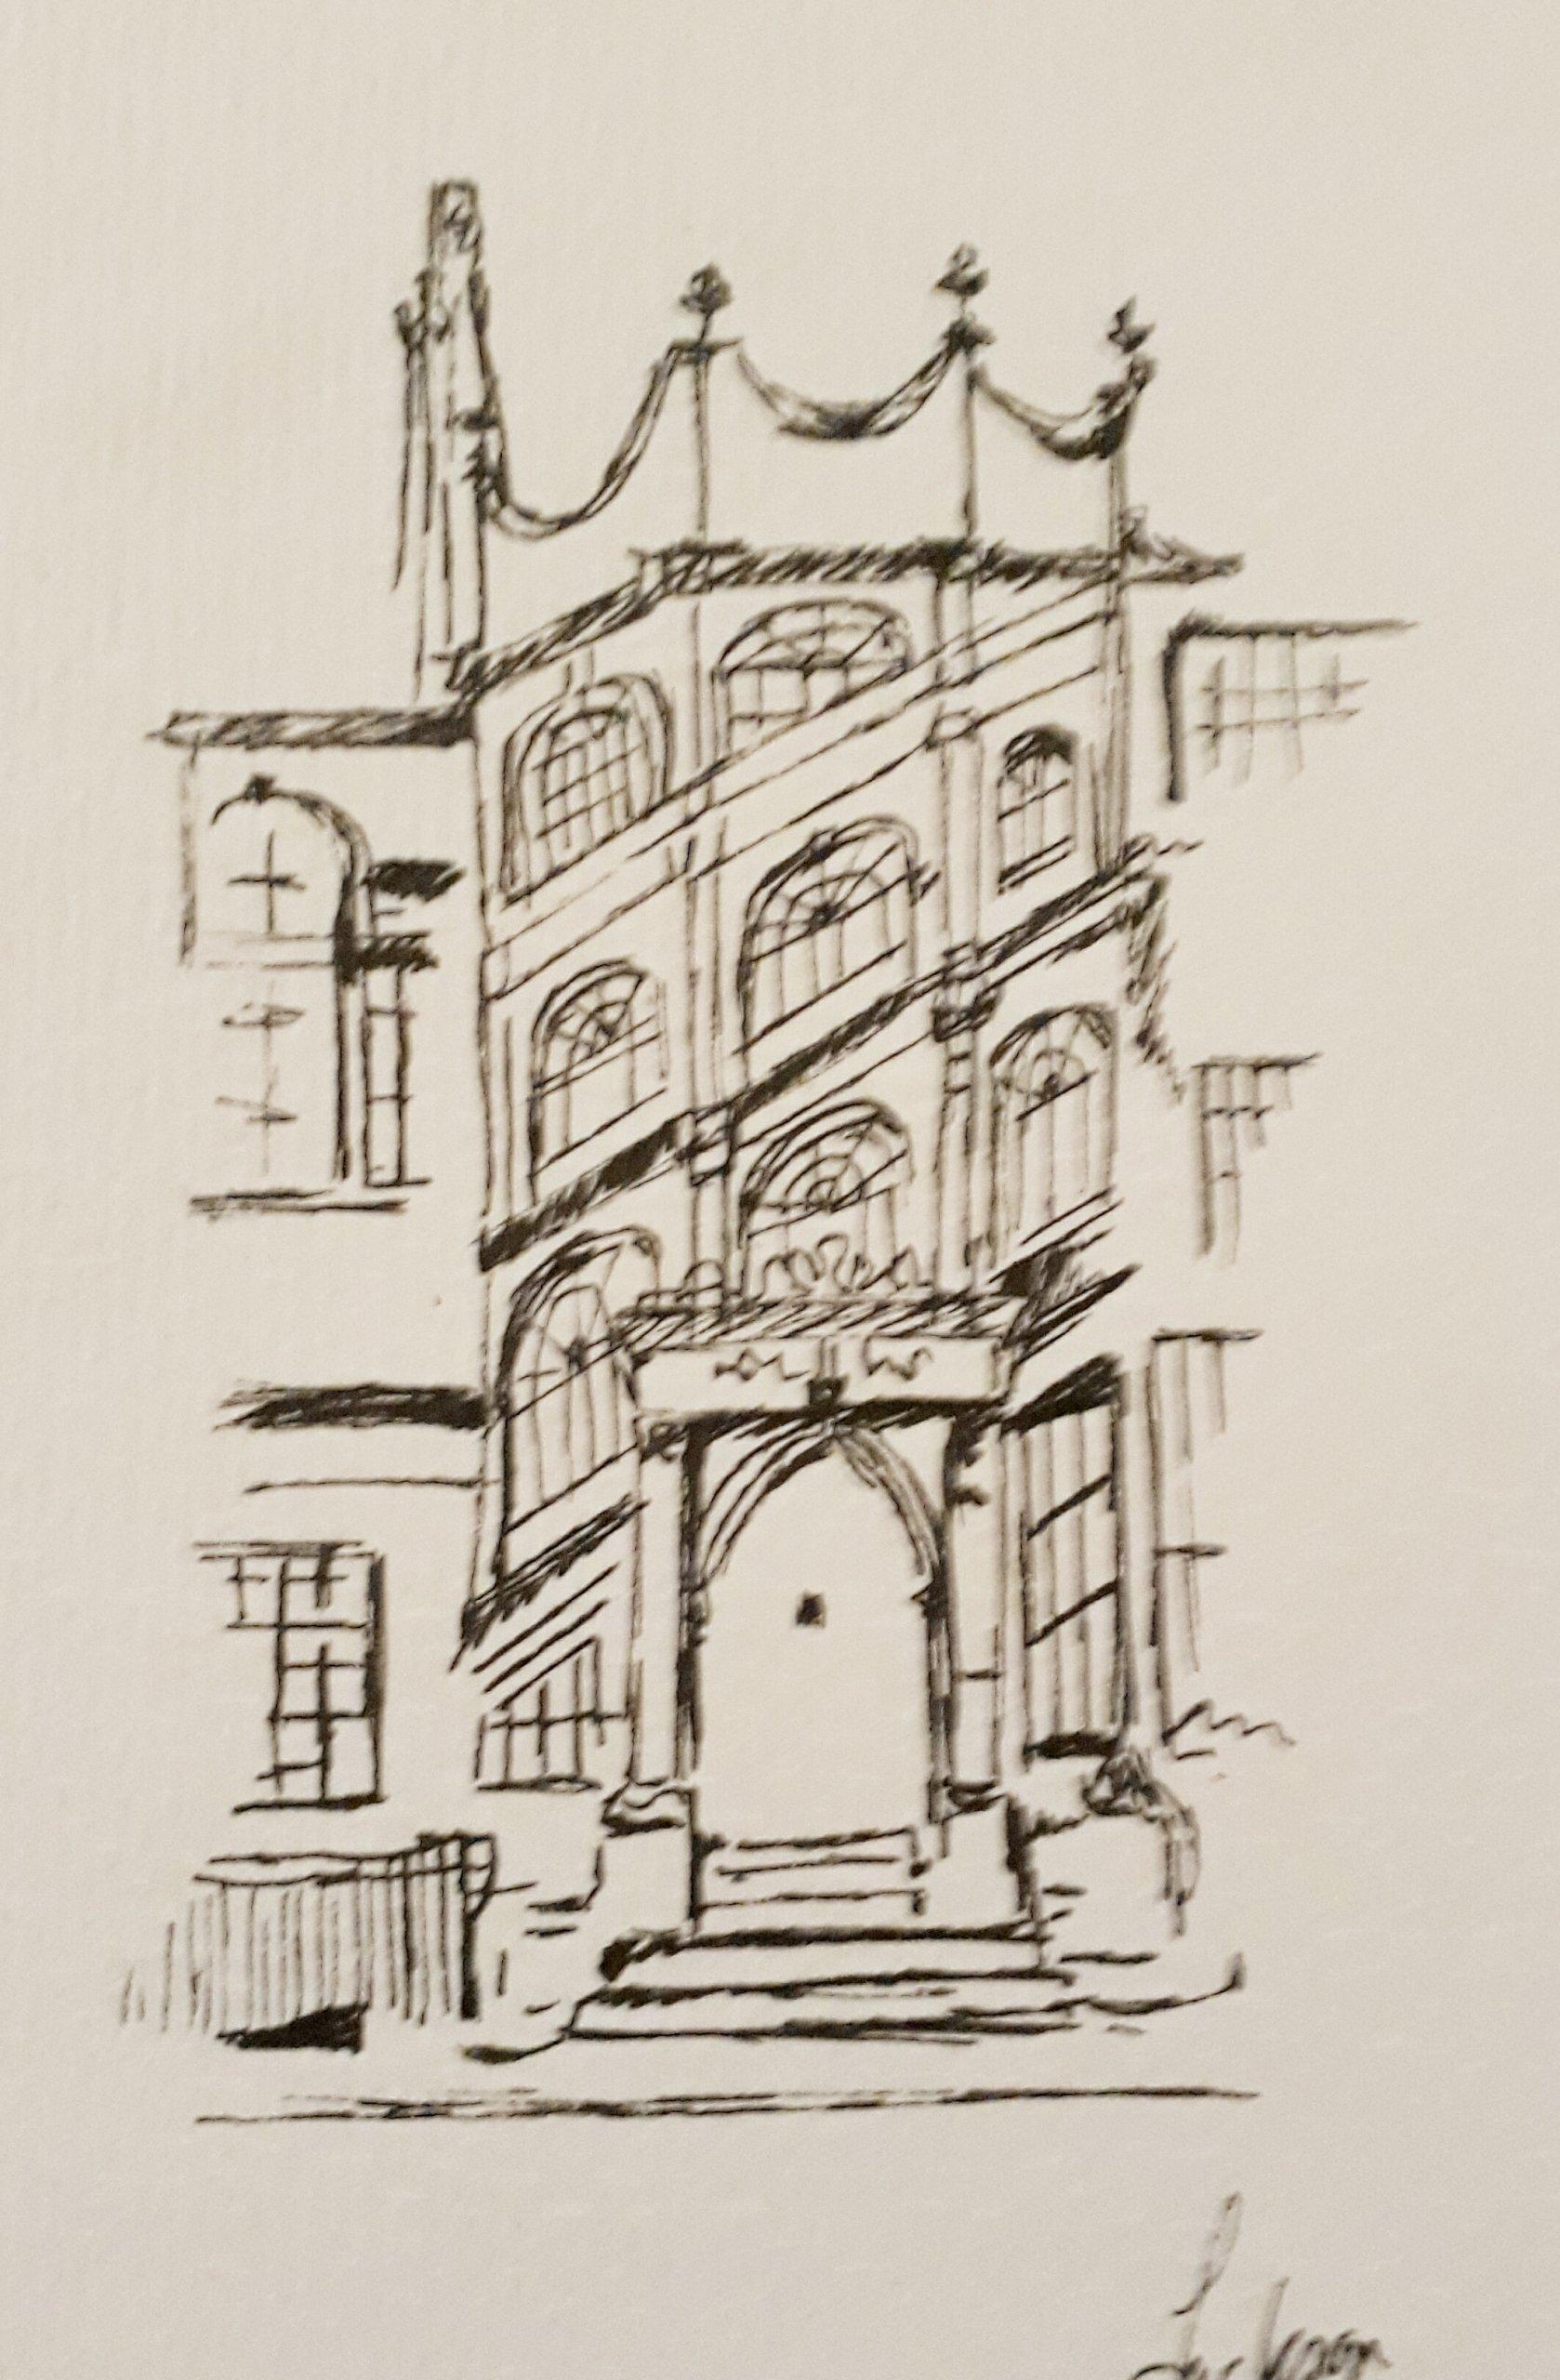 Oxford Building in Watercolour